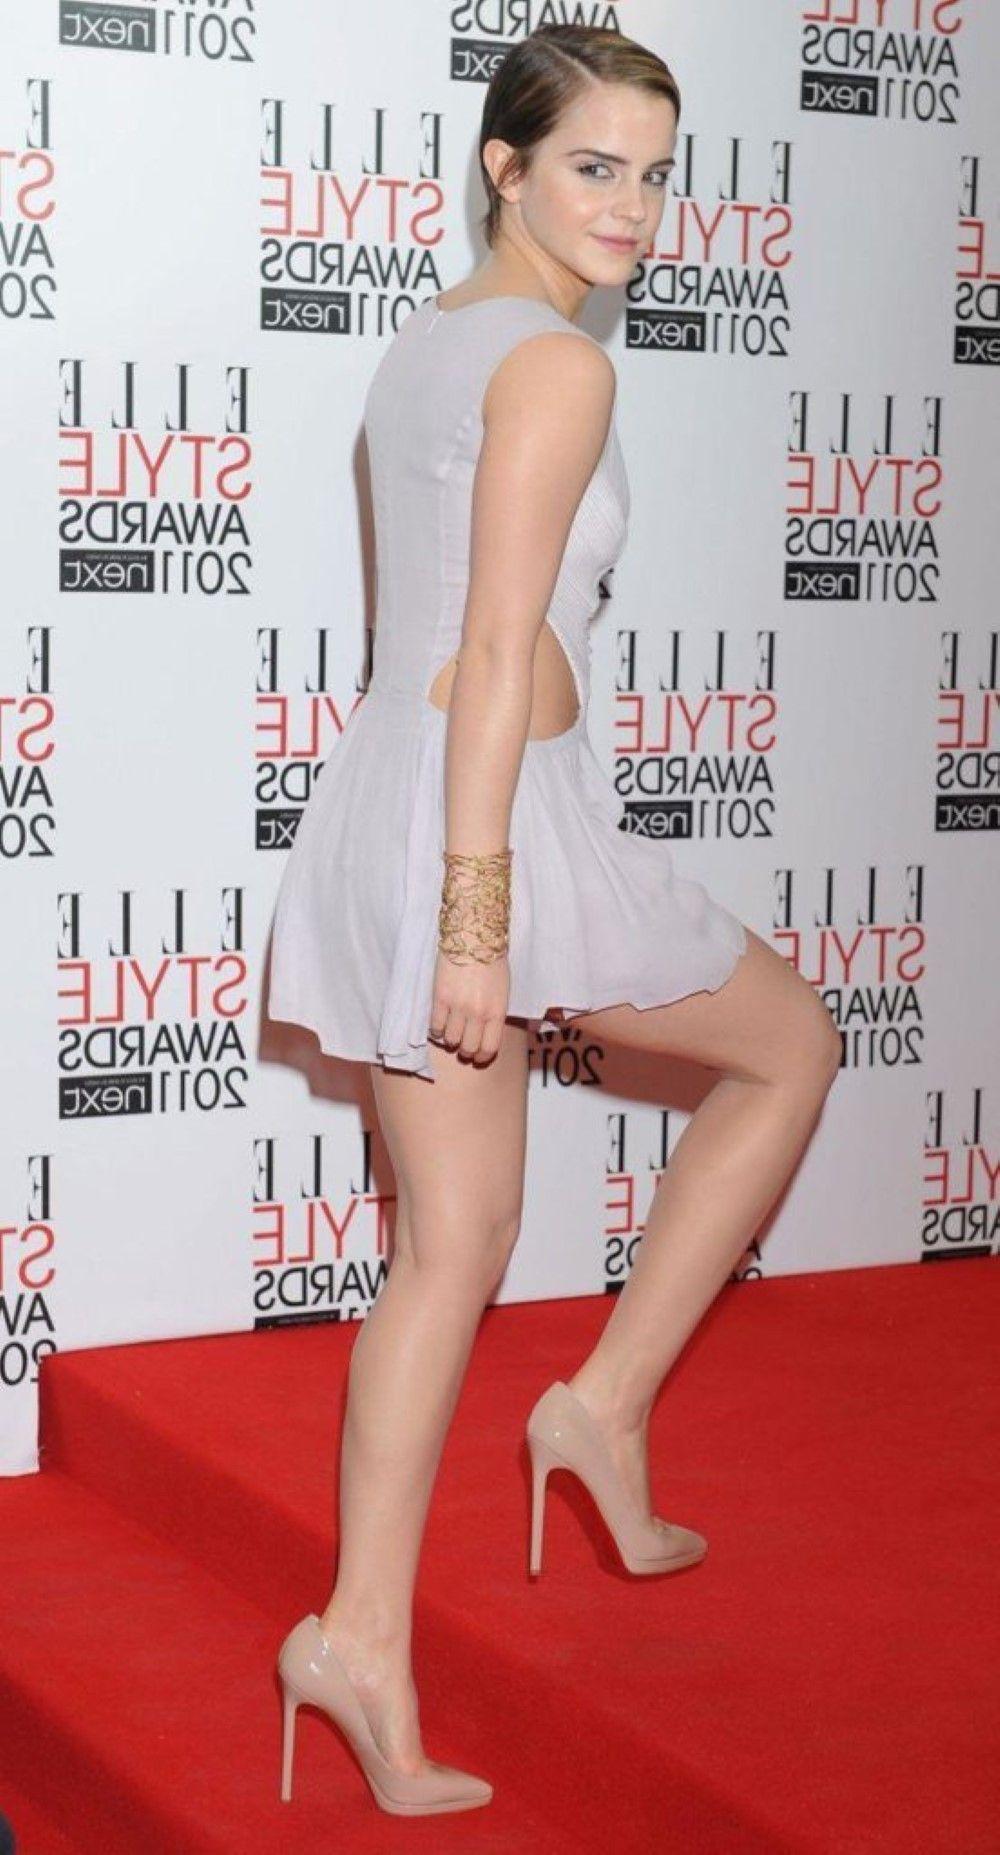 Emma Watson Icloud Leak photo 27